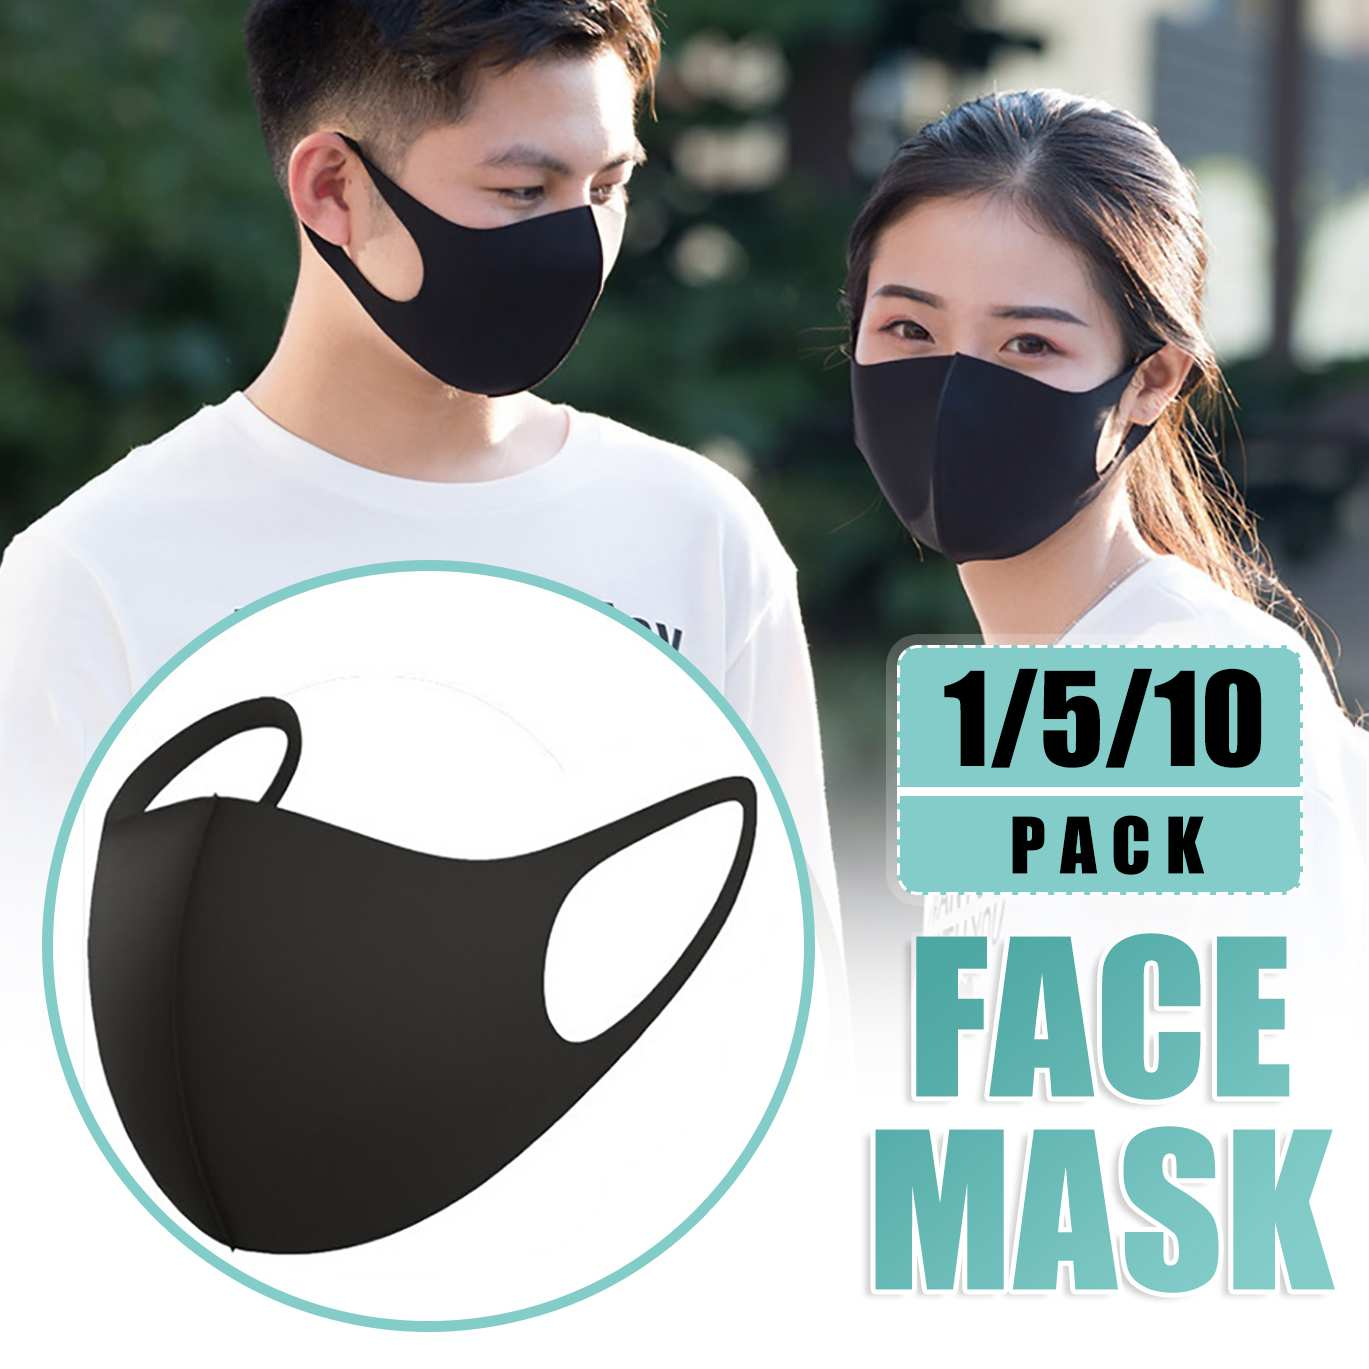 1/5/10Pcs Cotton Face Mask Mouth Mask Reusable Washable Earloop Mask Isolation Protection Anti Dust Haze Outdoor Dustproof Masks 1